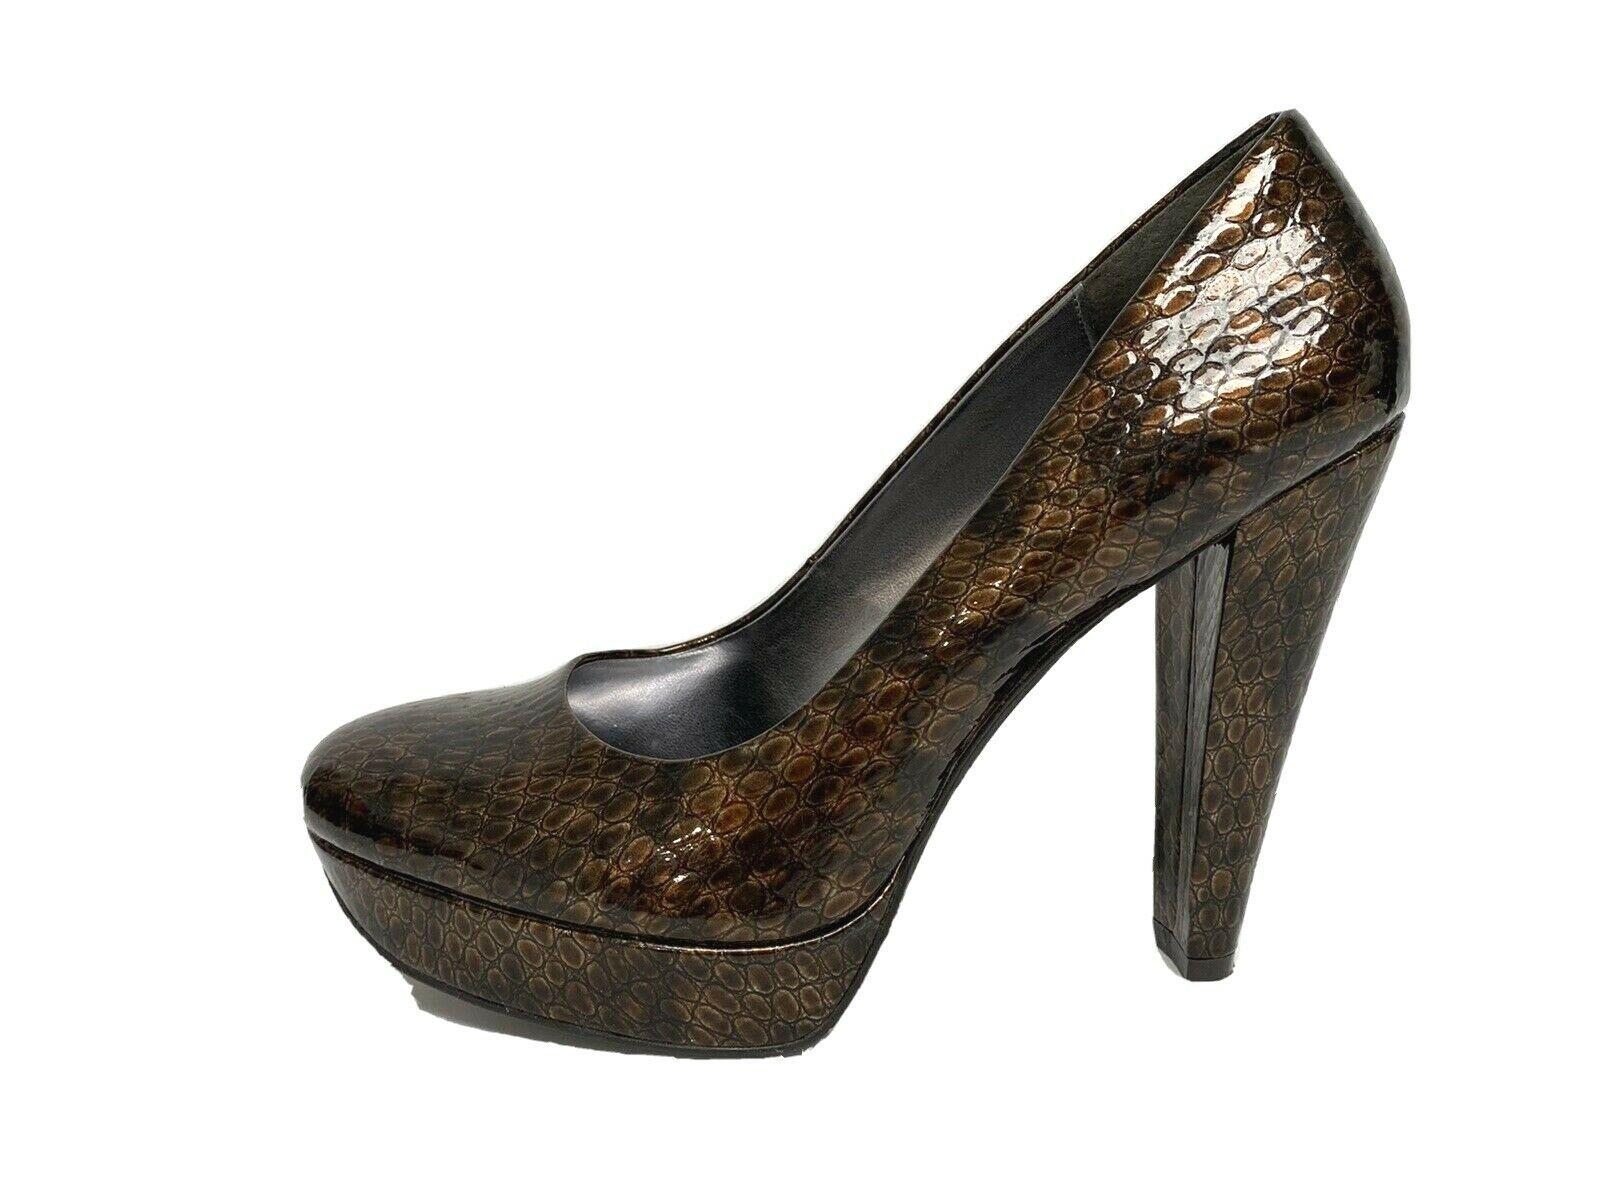 Calvin Klein Carley women's heel platform shoes animal print size 8M - $24.30